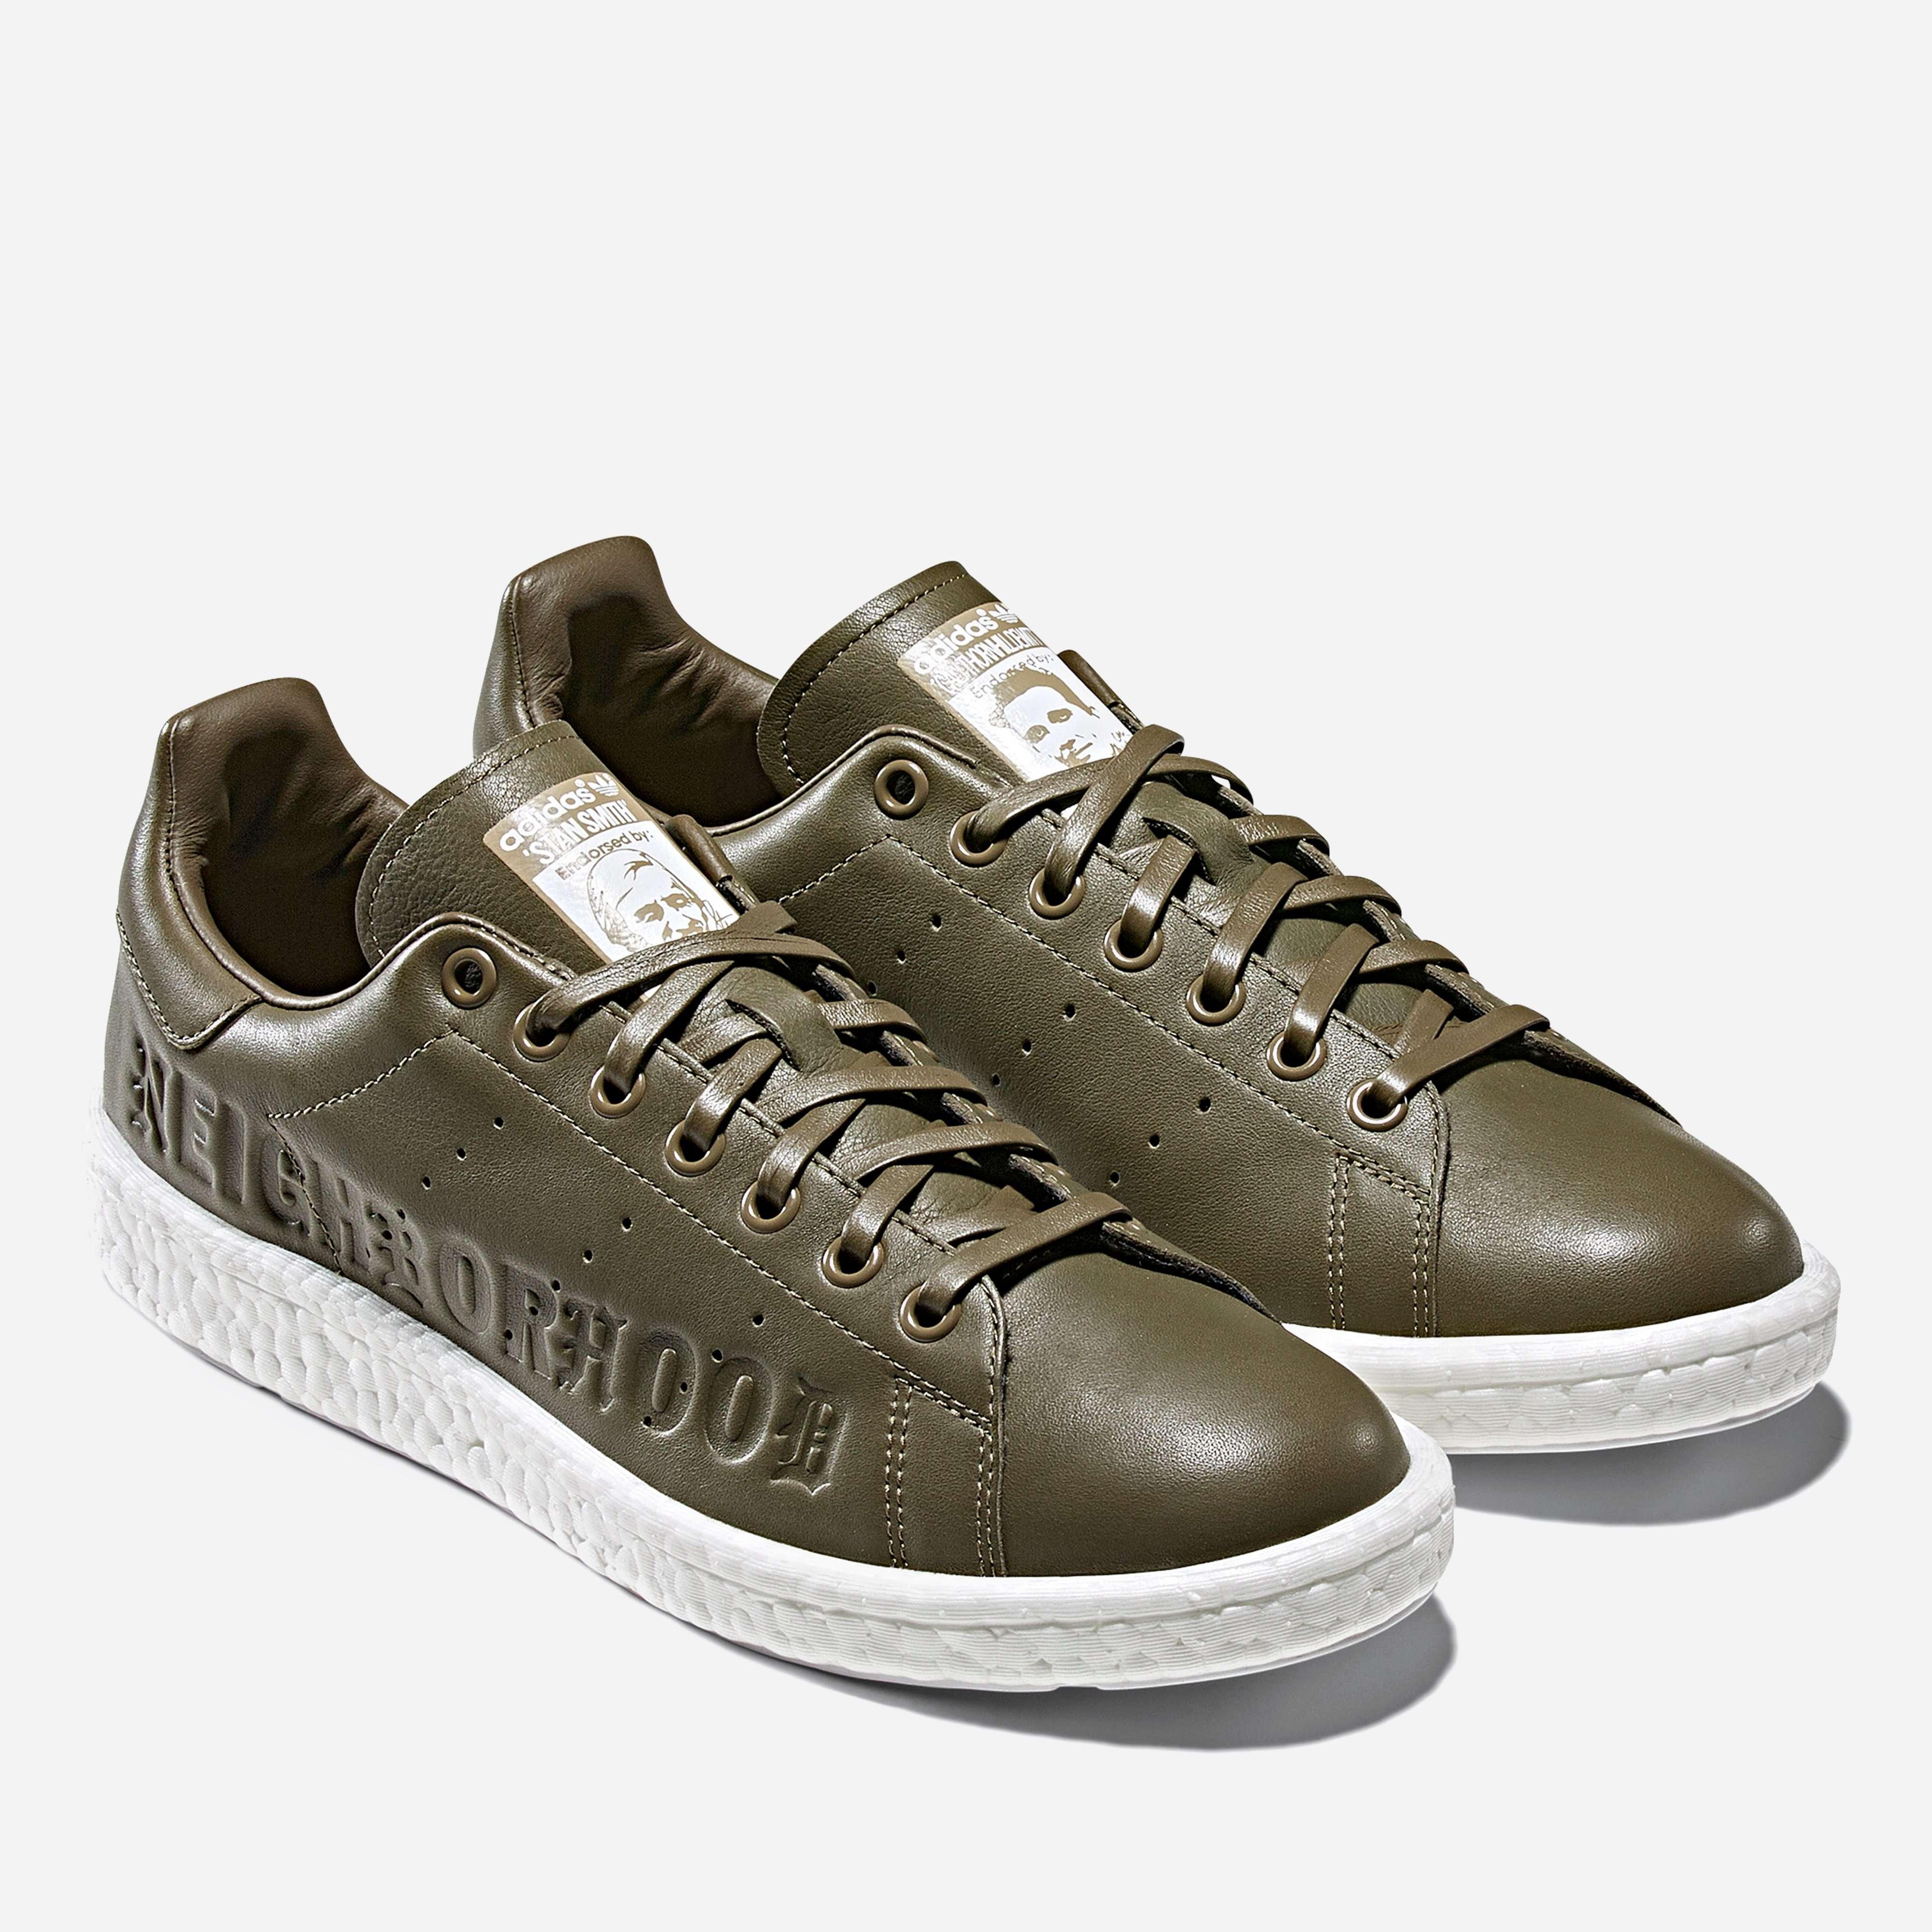 online store f4d83 a0c76 adidas Originals x Neighborhood Stan Smith Boost | The Hip Store